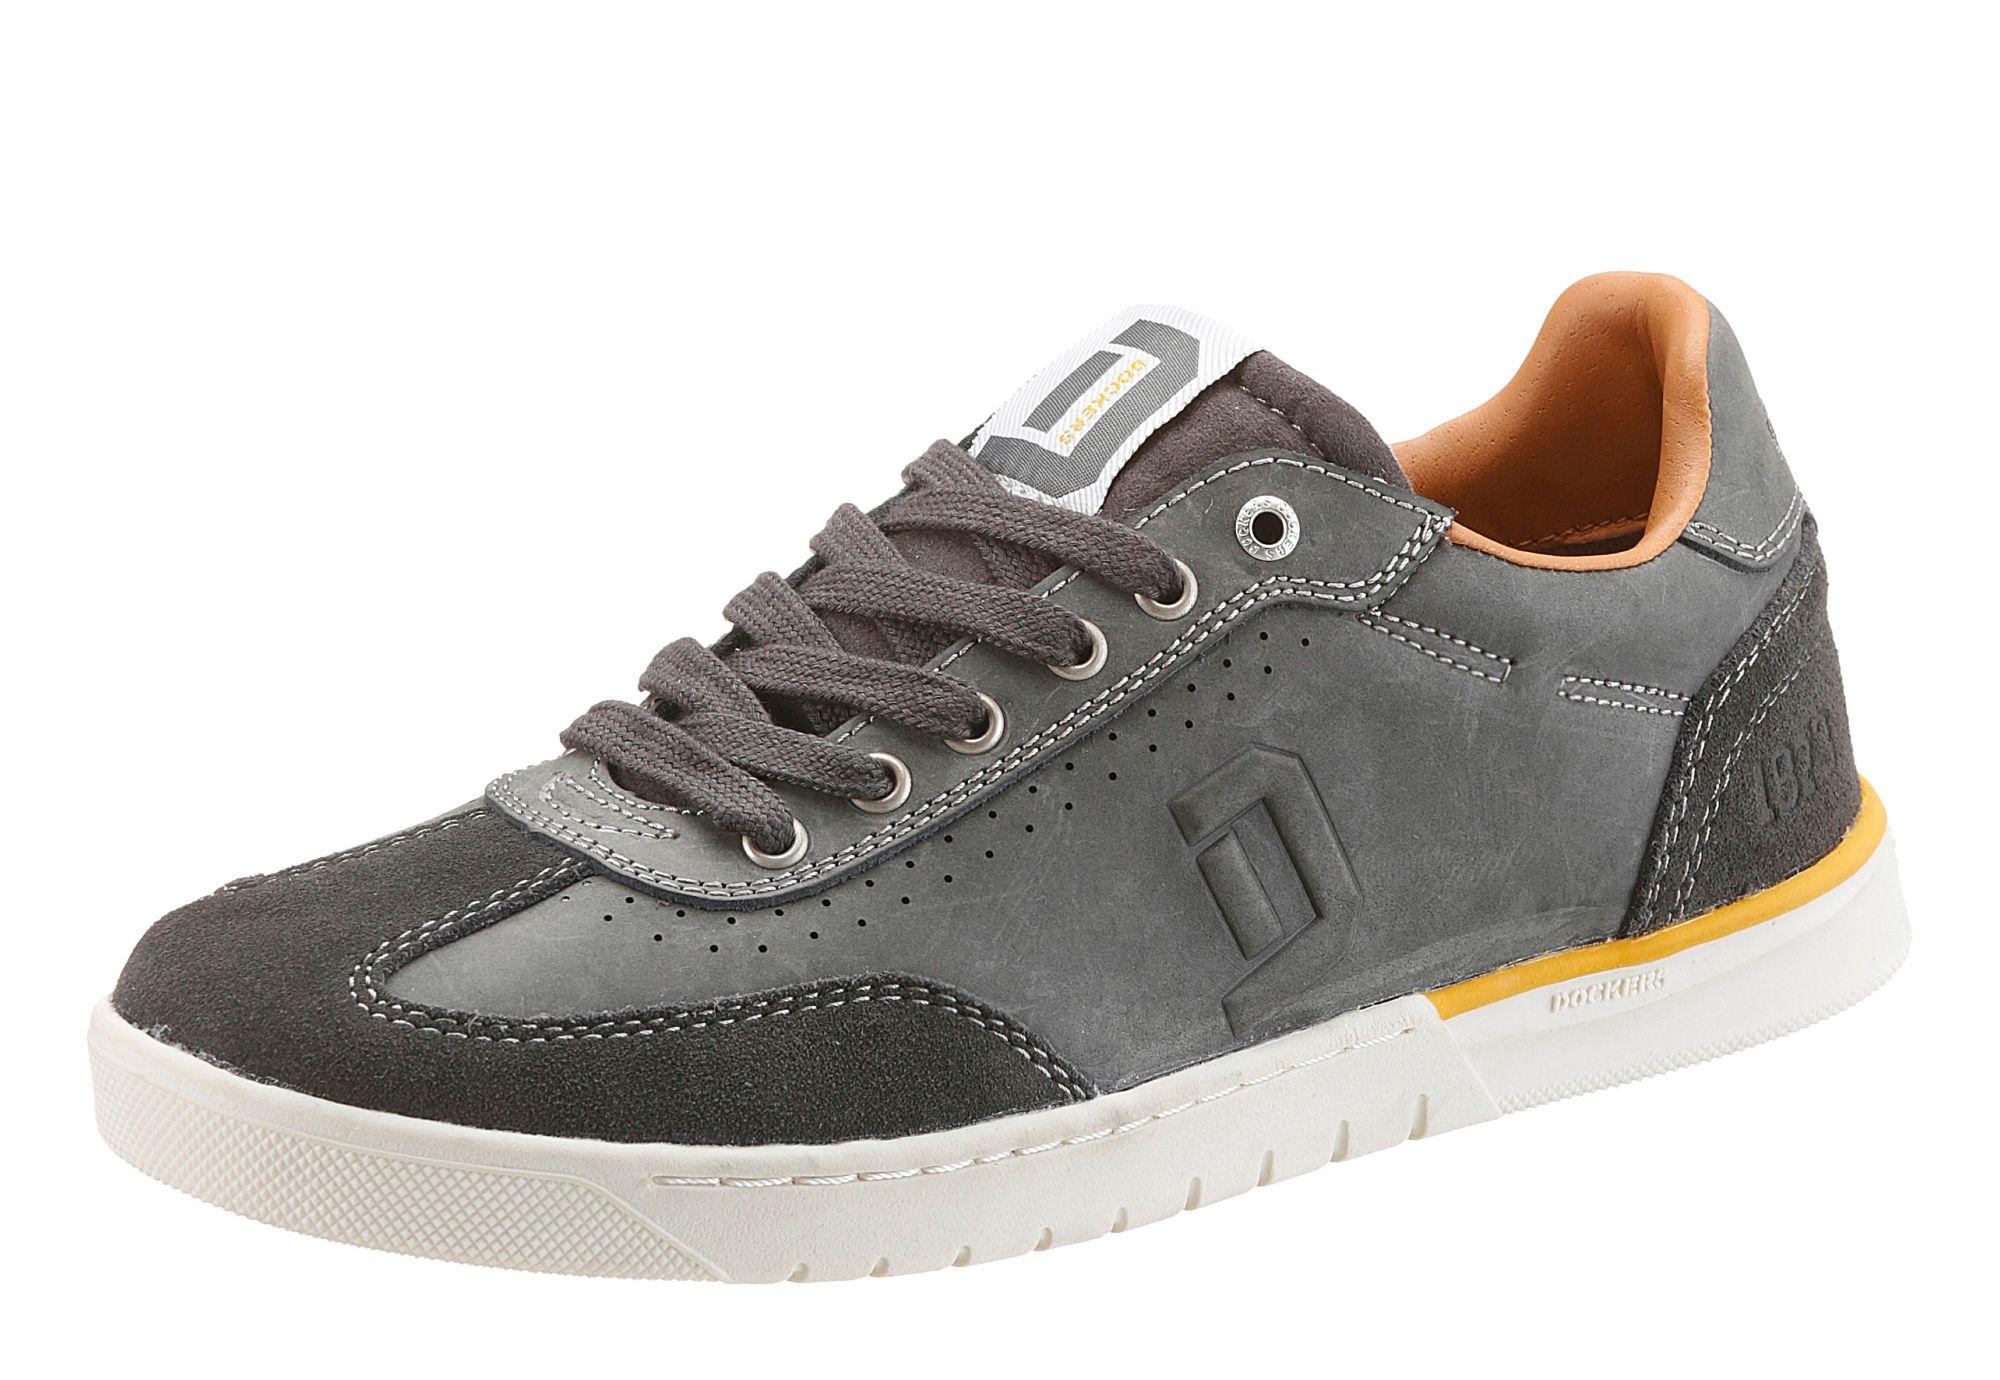 DOCKERS BY GERLI Dockers Sneaker im Materialmix